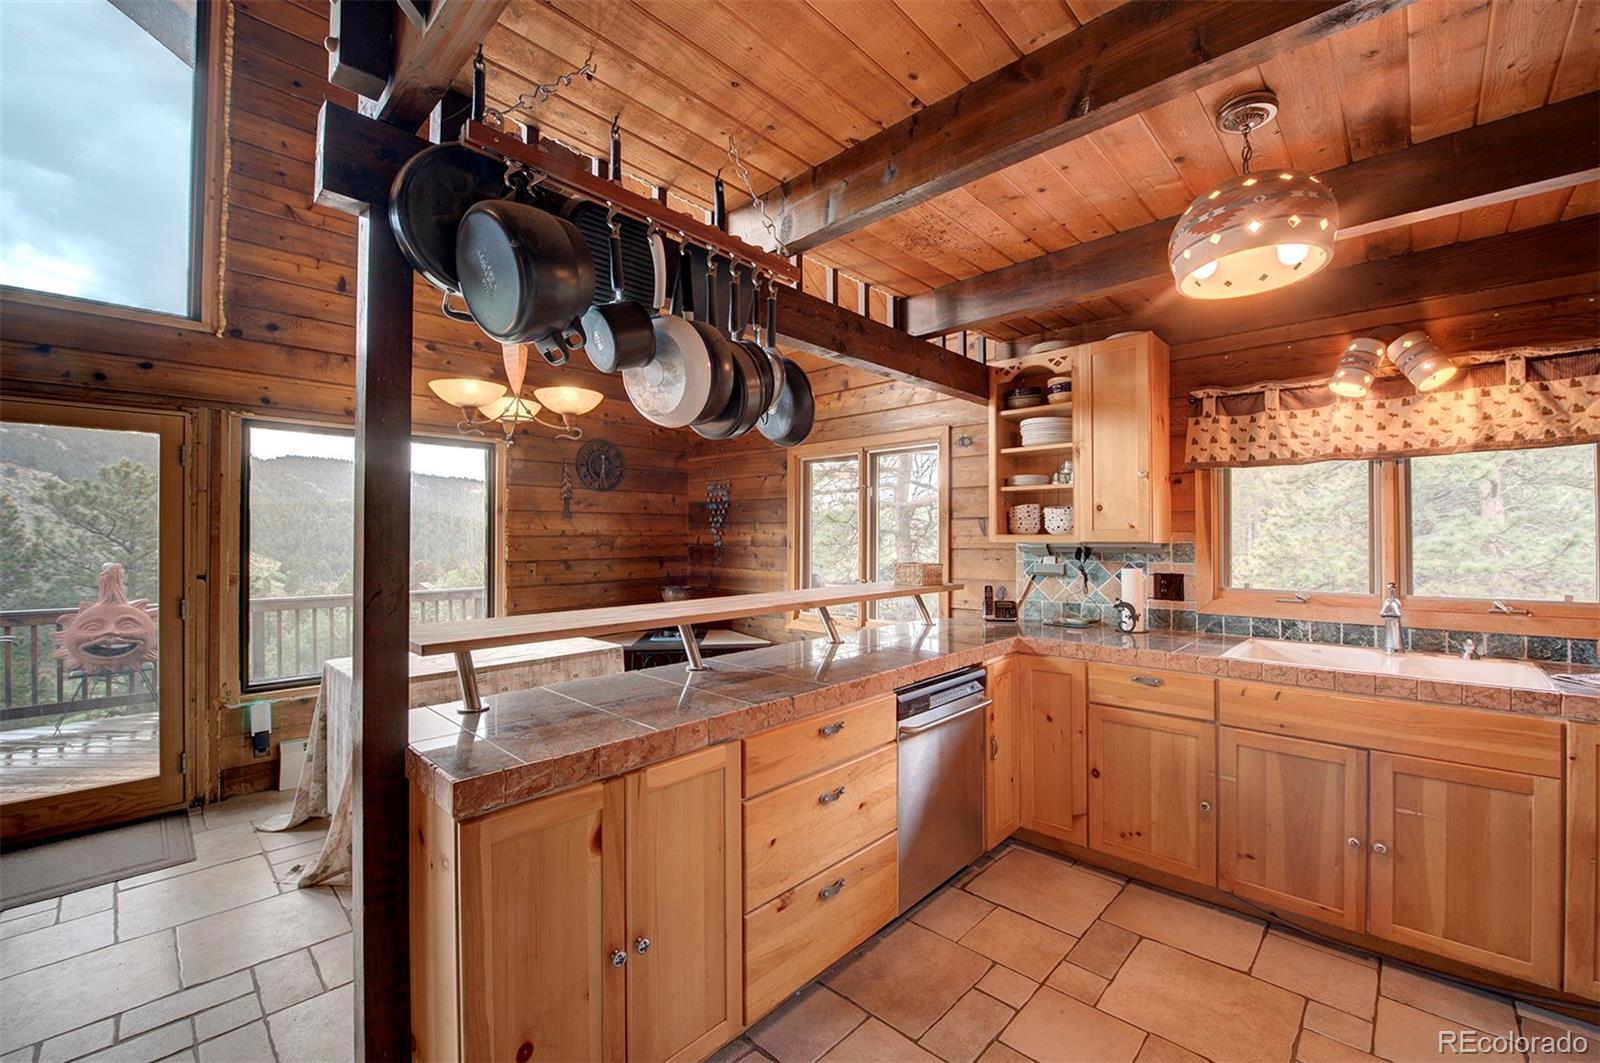 MLS# 6922377 - 2 - 12123 Geronimo Trail, Conifer, CO 80433